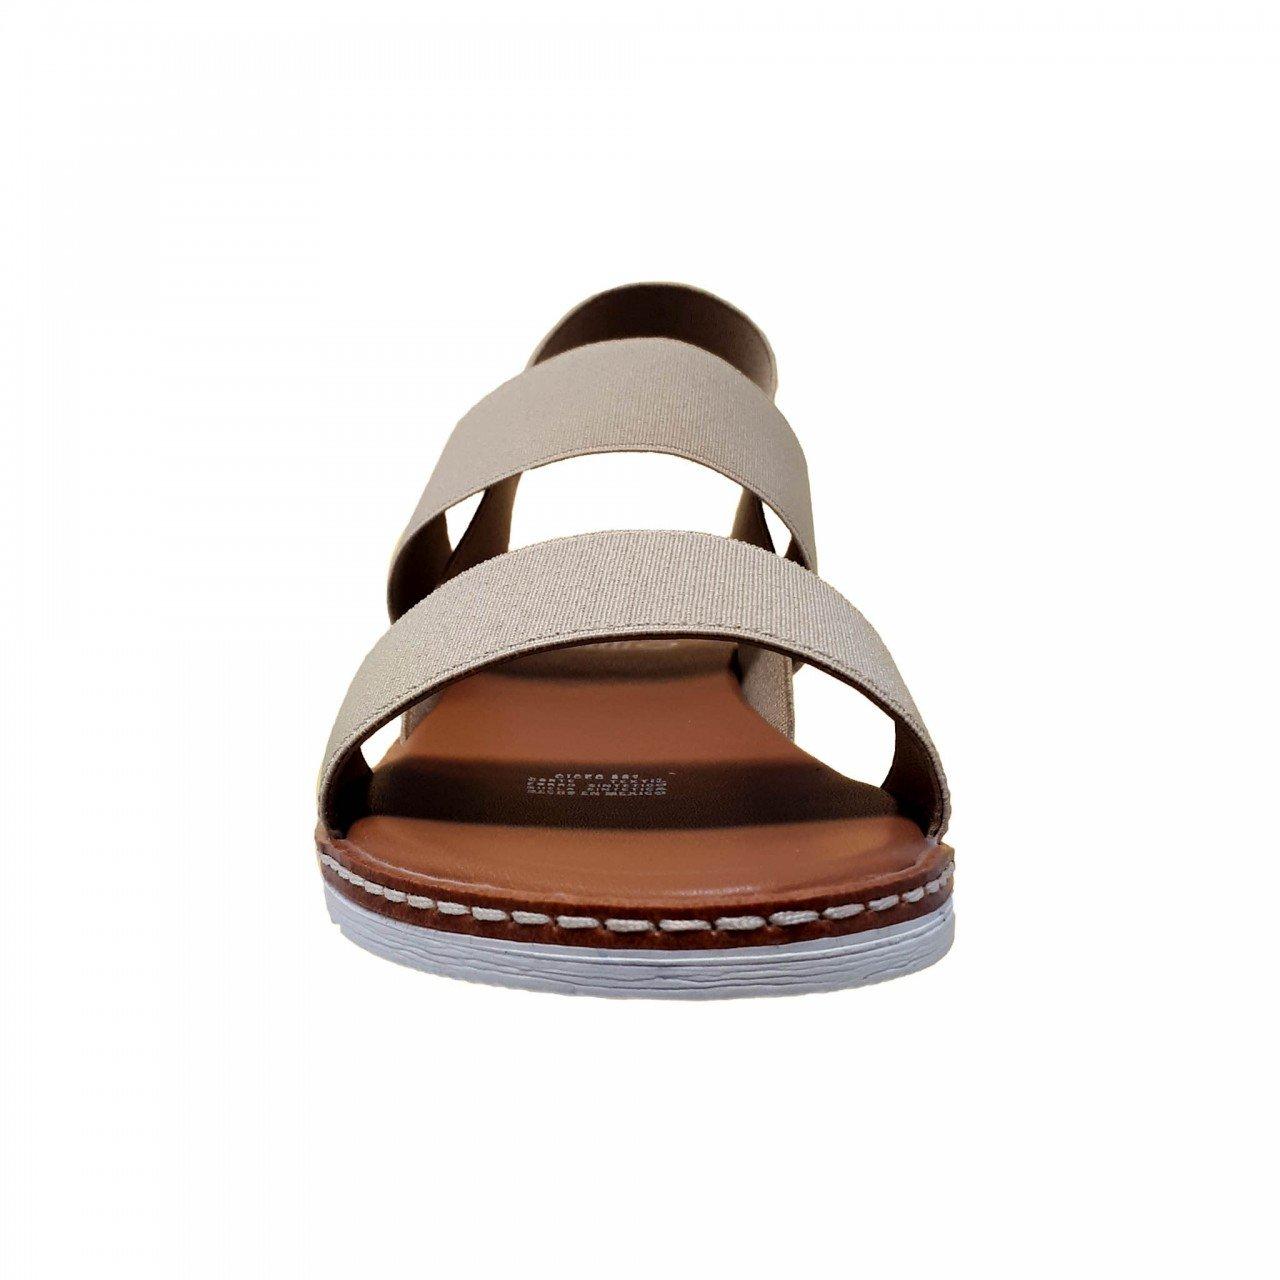 Sandalia beige Gillio 822001